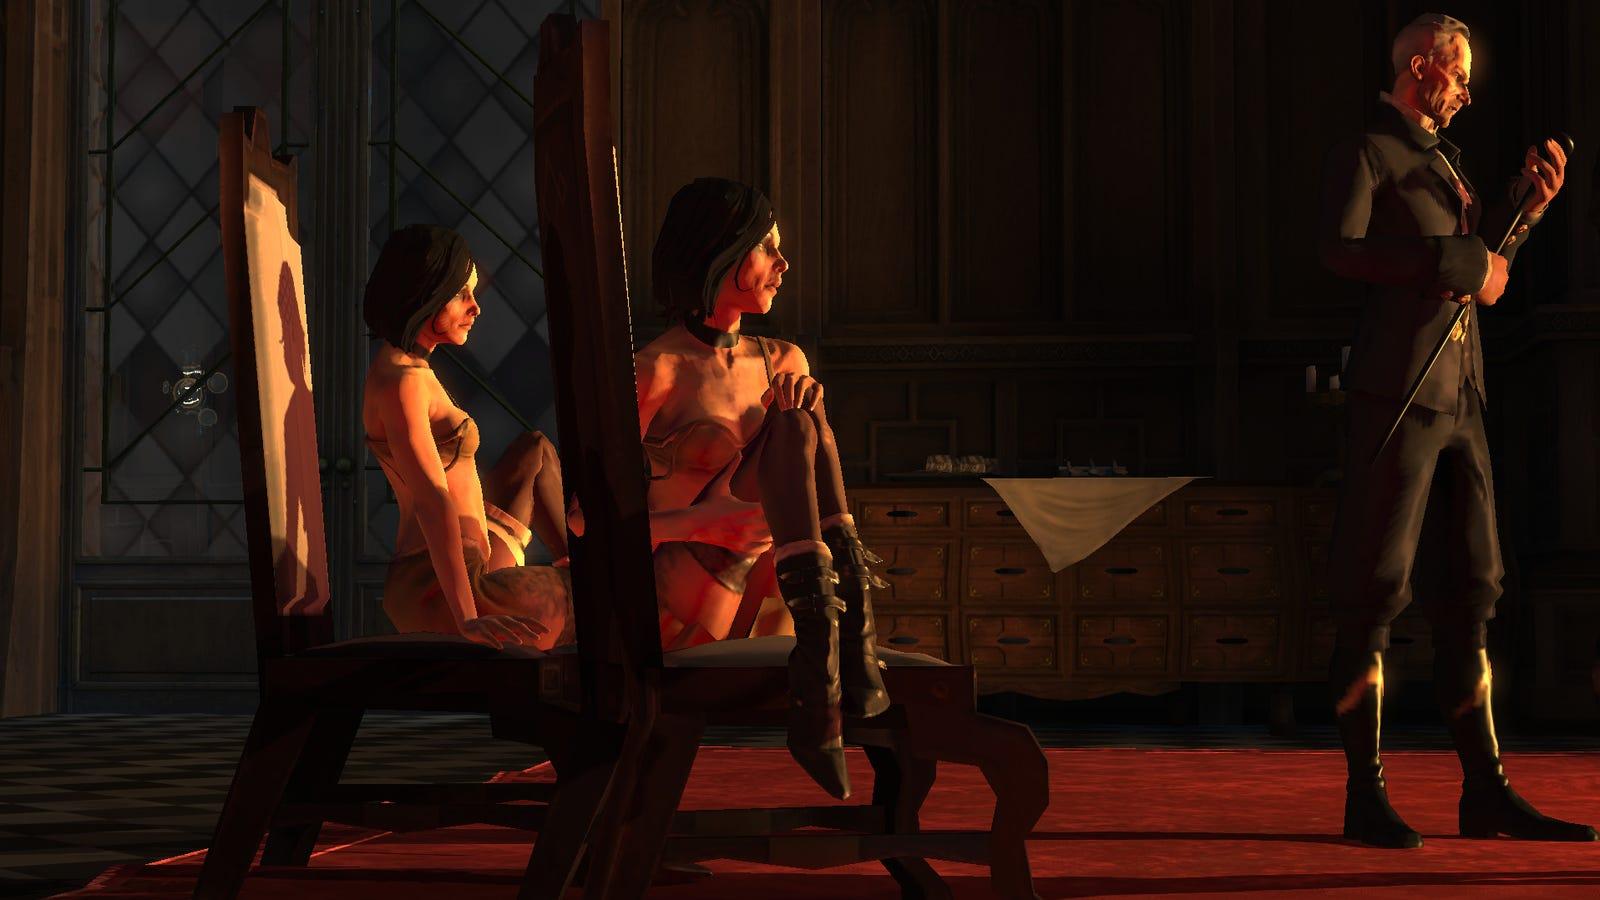 Секс на dark messiah